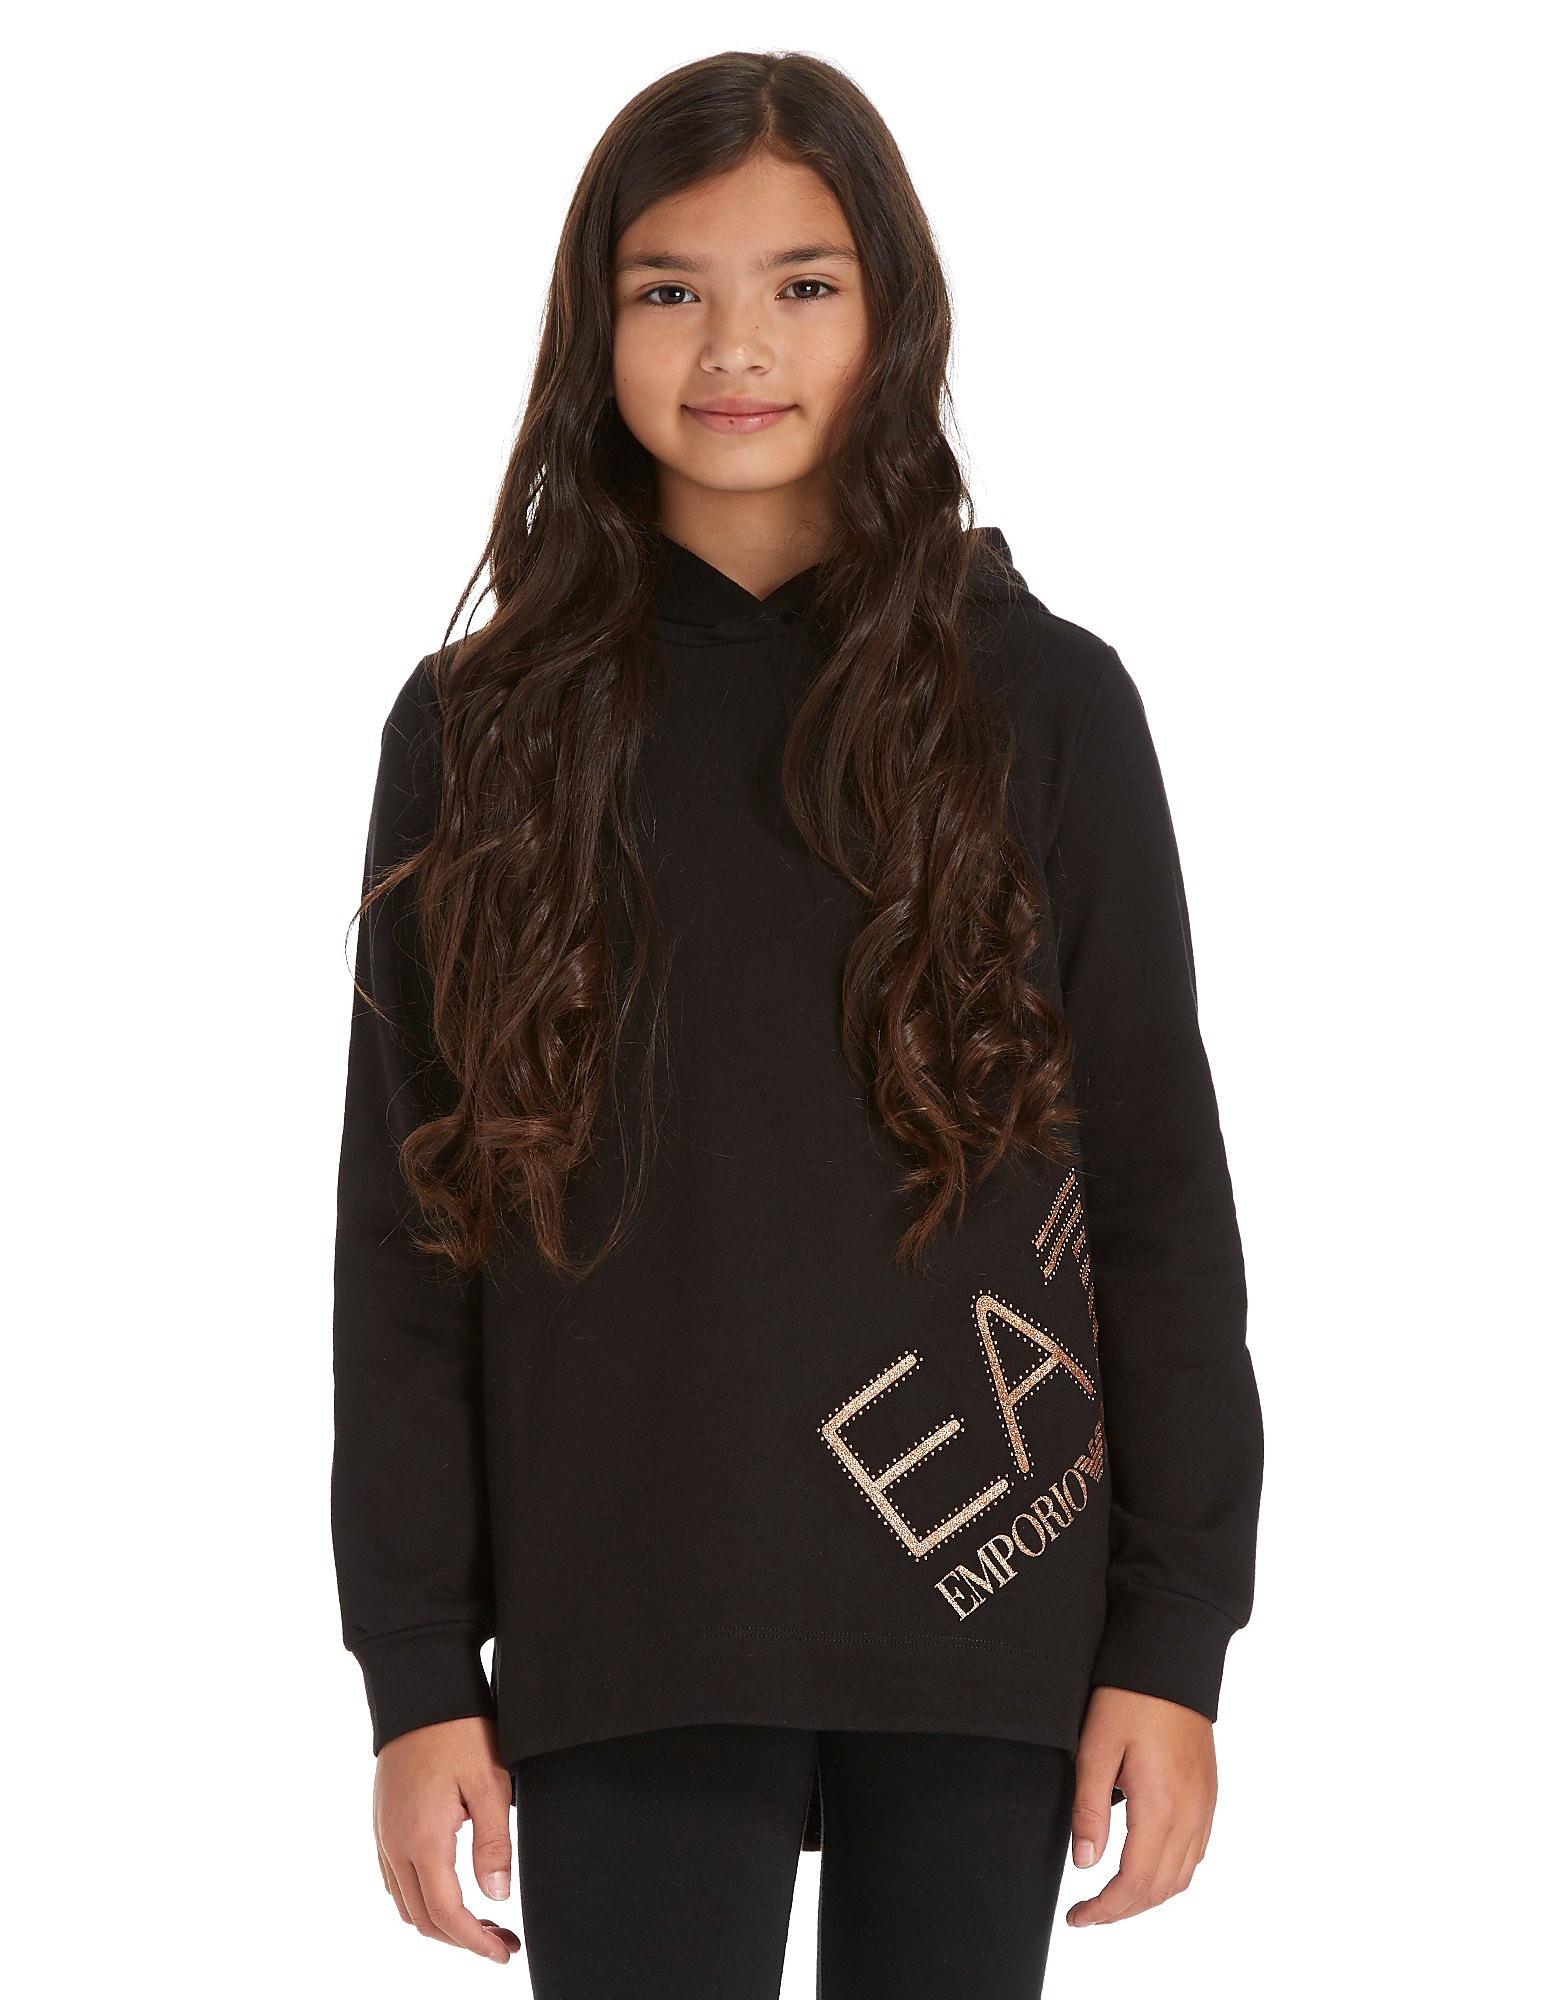 Emporio Armani EA7 Girls' Longline Hoodie Junior